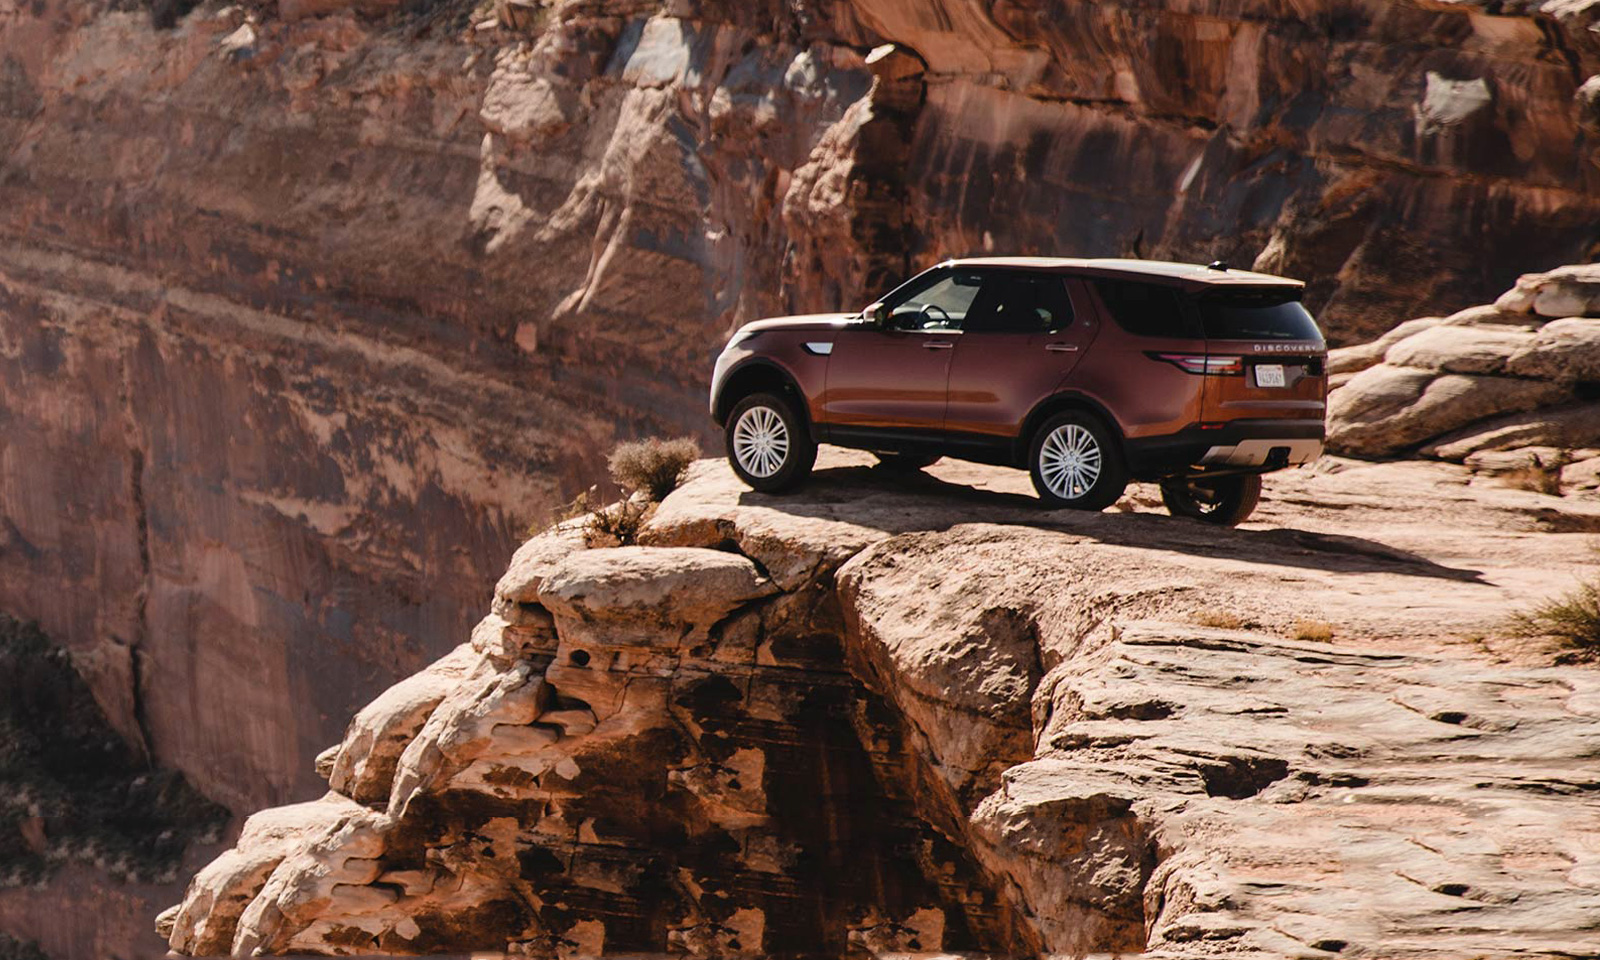 land rover adventure travel - HD1600×960